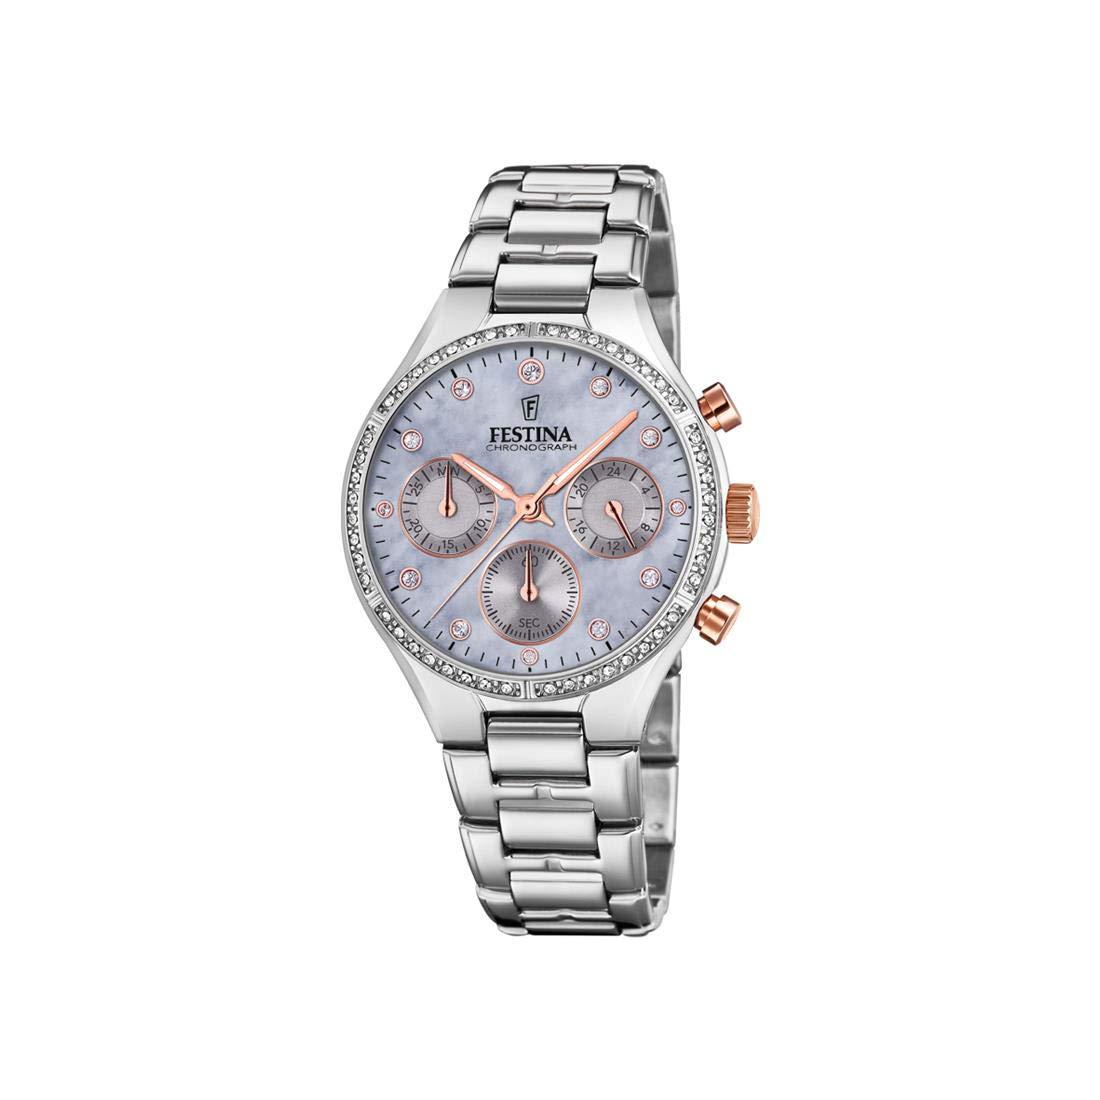 Festina-Damen-Chronograph-Quarz-Uhr-mit-Edelstahl-Armband-F204013